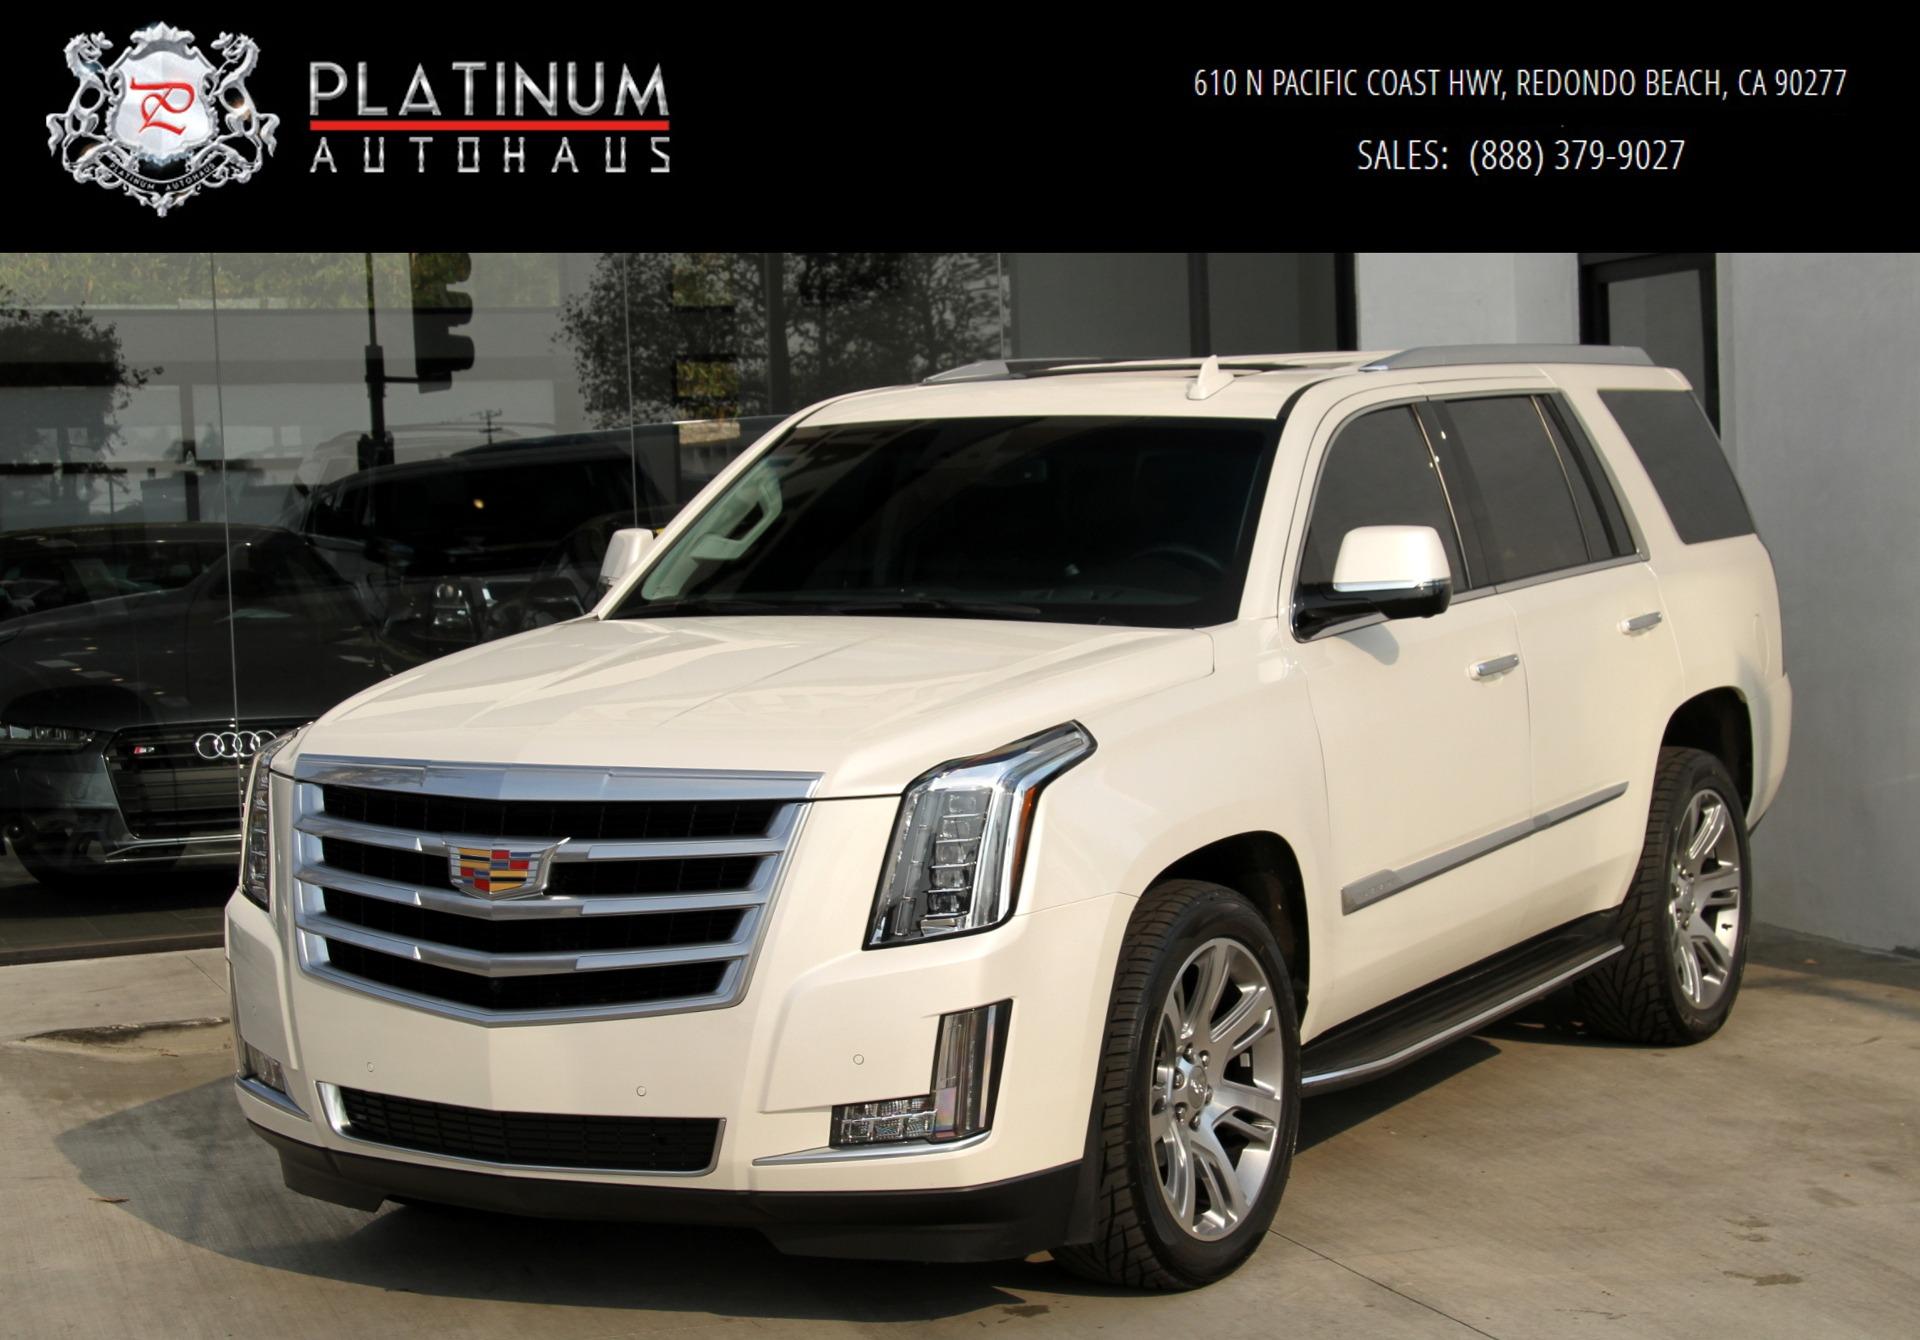 Used 2015 Escalade For Sale >> 2015 Cadillac Escalade Luxury Stock 6080 For Sale Near Redondo